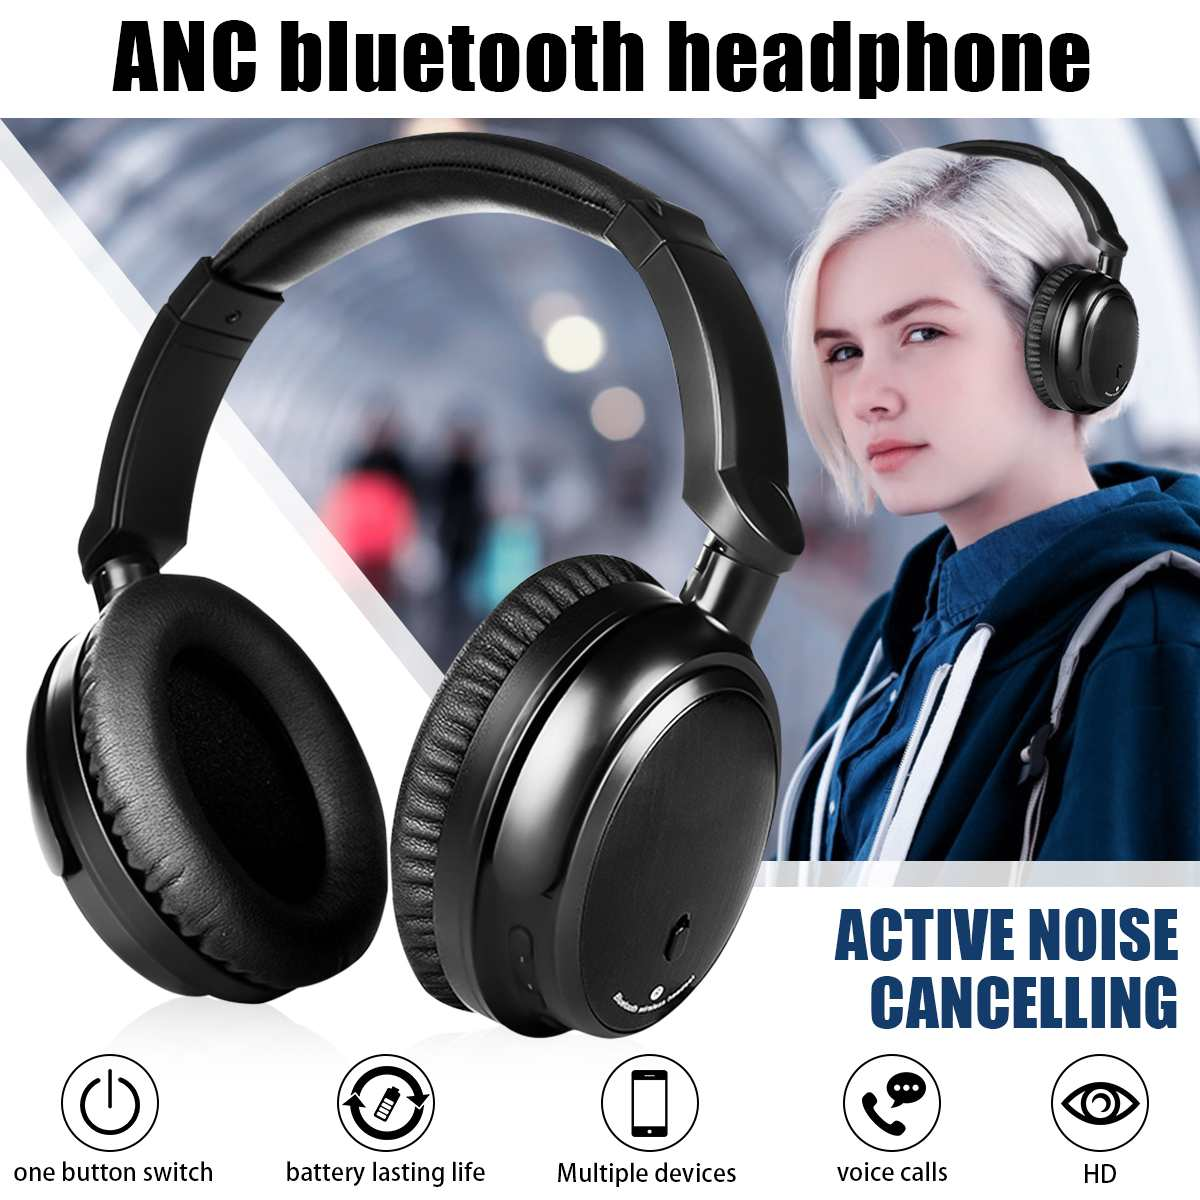 ANC Active หูฟังไร้สาย bluetooth HiFi ชุดหูฟังแบบสเตอริโอหูฟังพร้อมไมโครโฟนสำหรับ iphone สำหรับ Xiaomi-ใน หูฟังบลูทูธและชุดหูฟัง จาก อุปกรณ์อิเล็กทรอนิกส์ บน AliExpress - 11.11_สิบเอ็ด สิบเอ็ดวันคนโสด 1